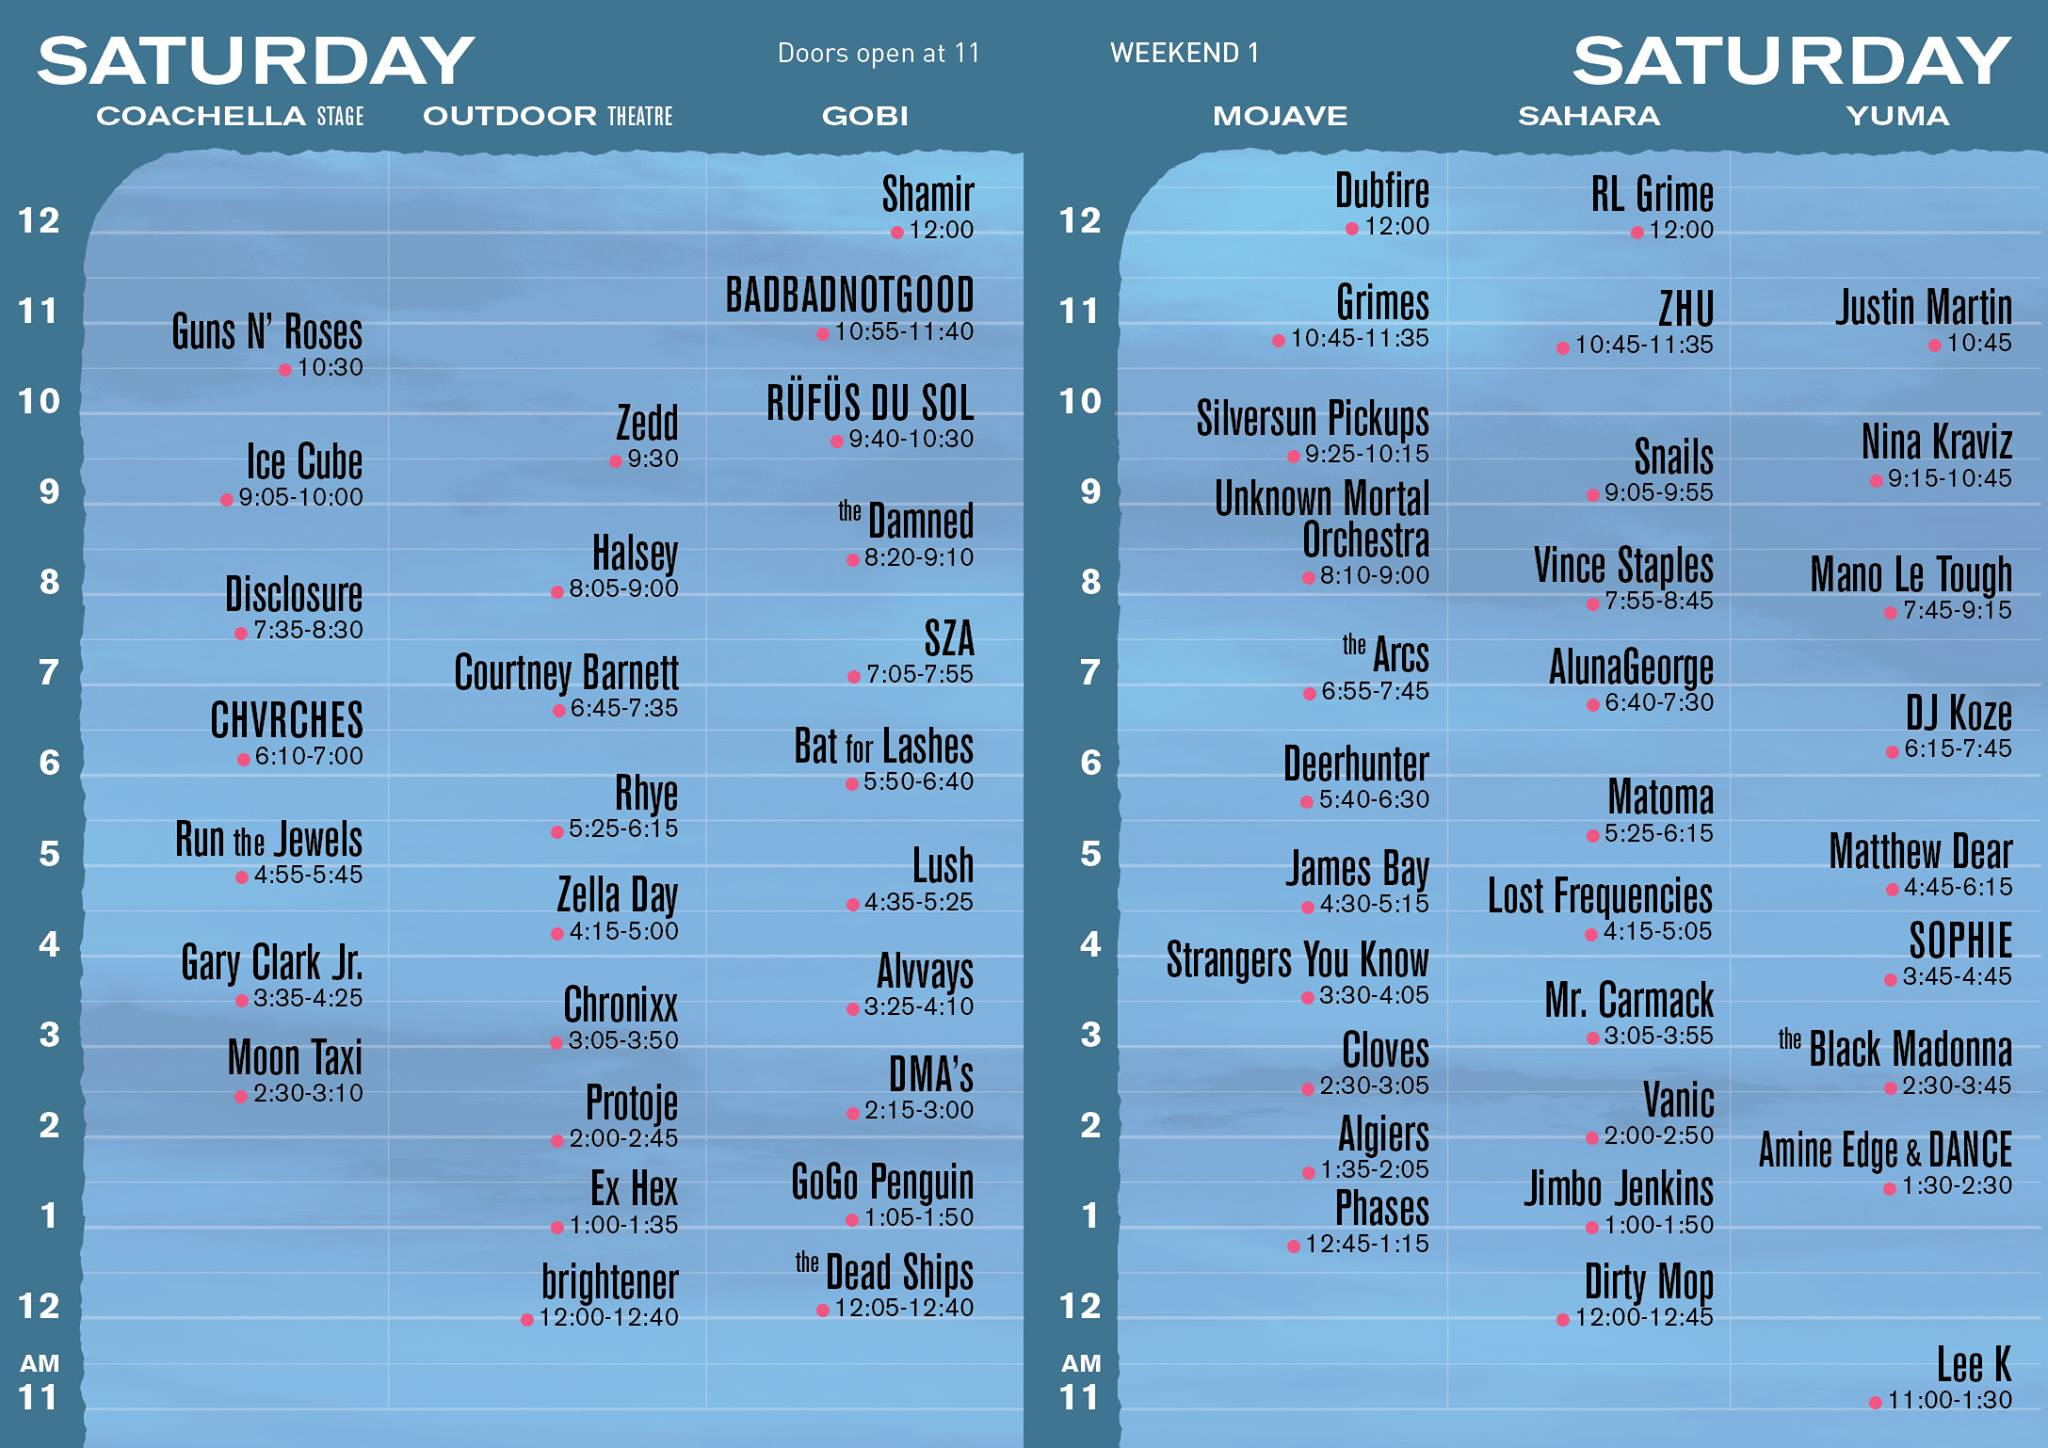 Saturday-Coachella-Set-Times